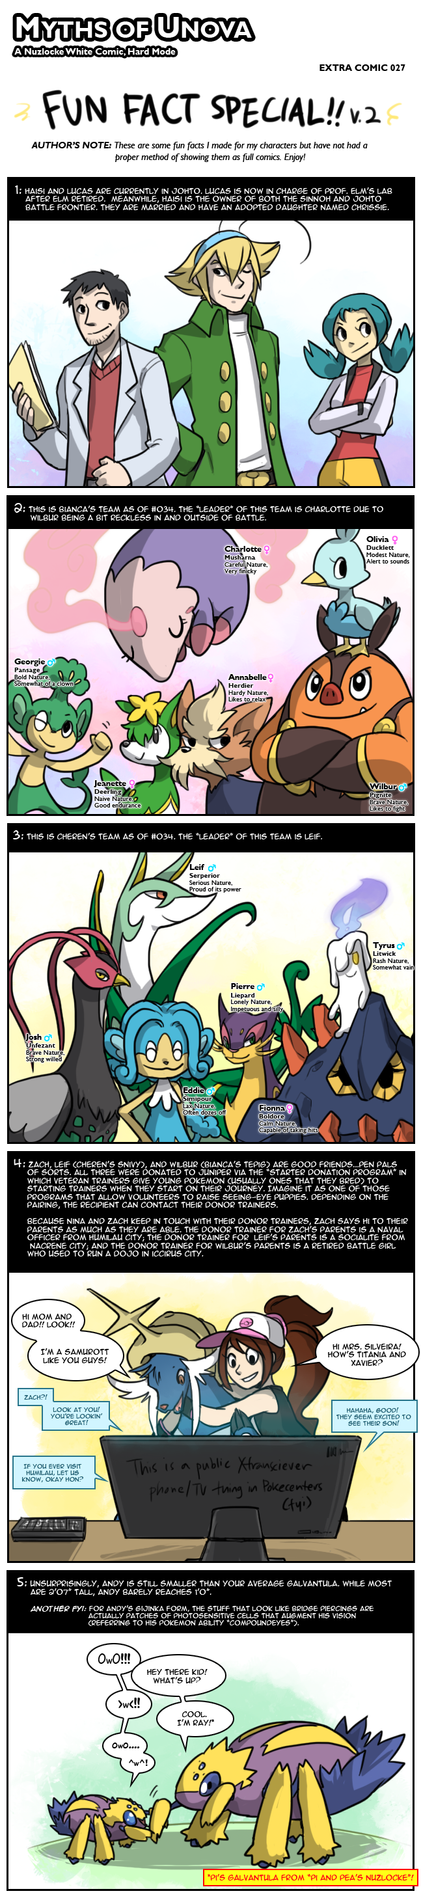 Nuzlocke White: Extra Comic 27 by ky-nim